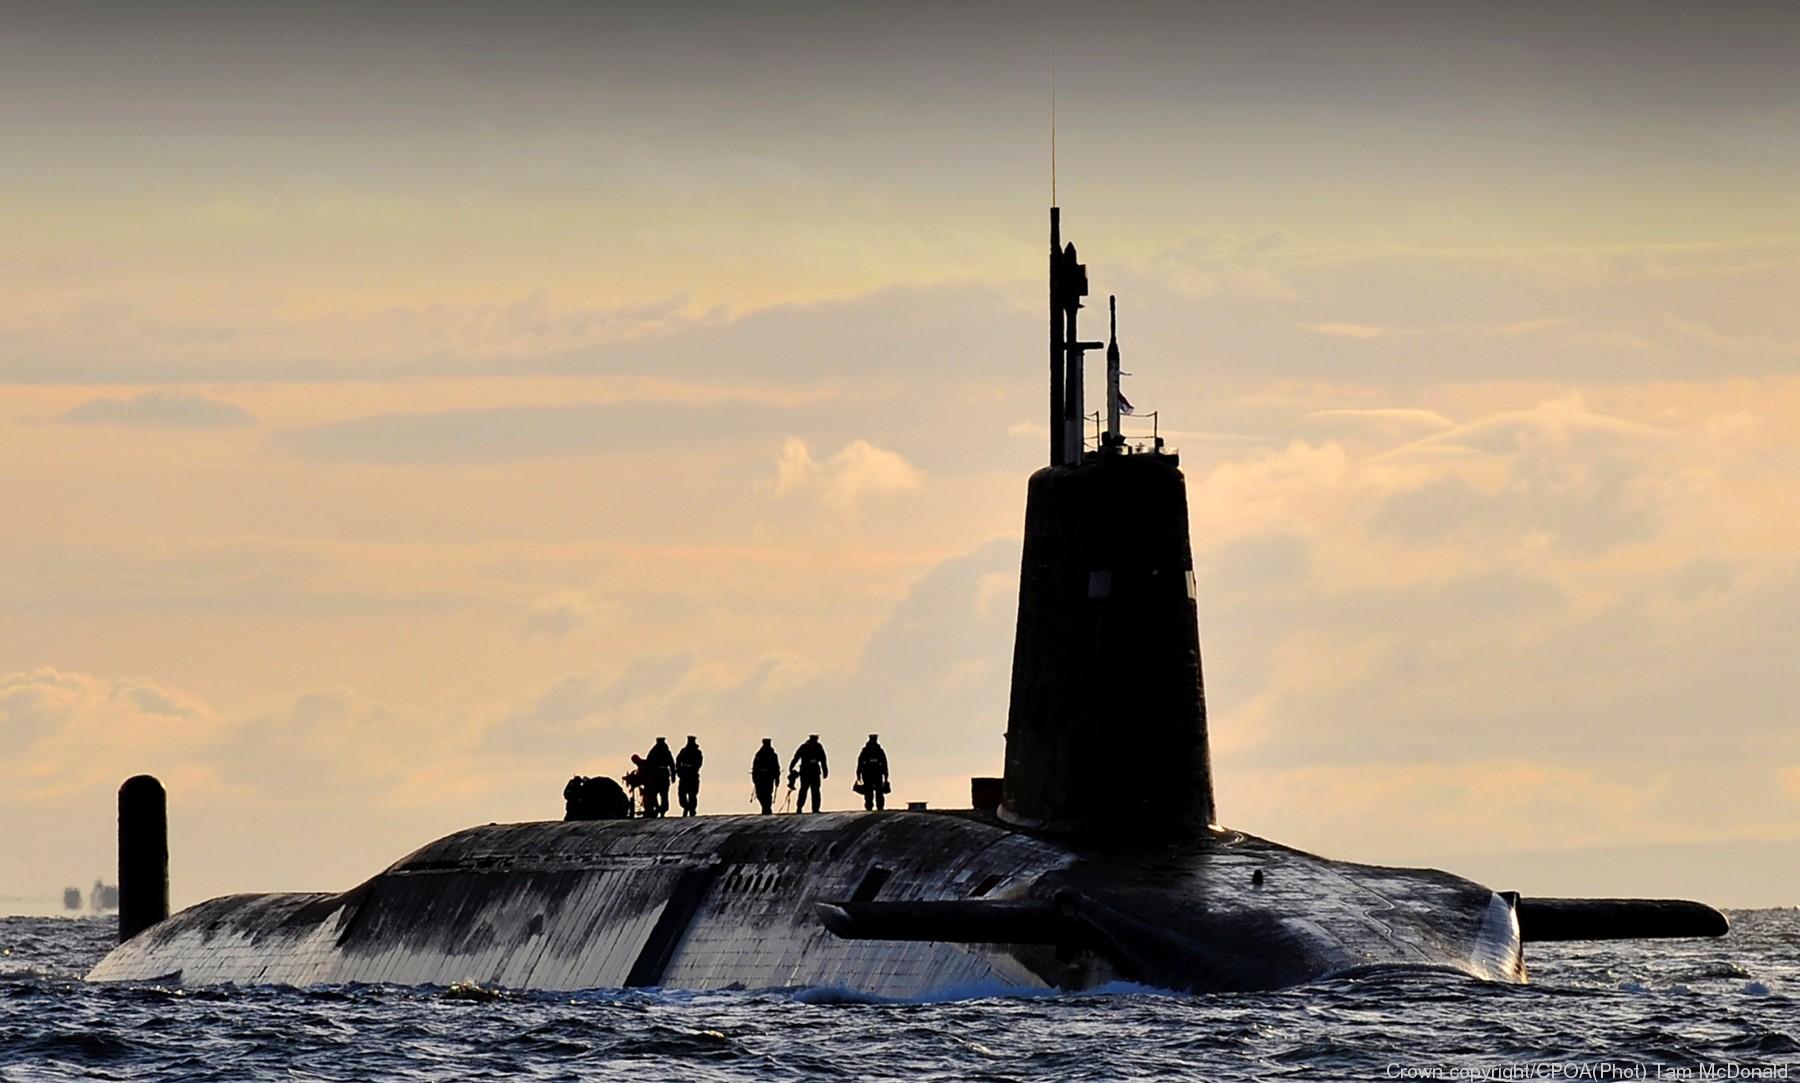 Vanguard class Ballistic Missile Submarine SSBN - Royal Navy